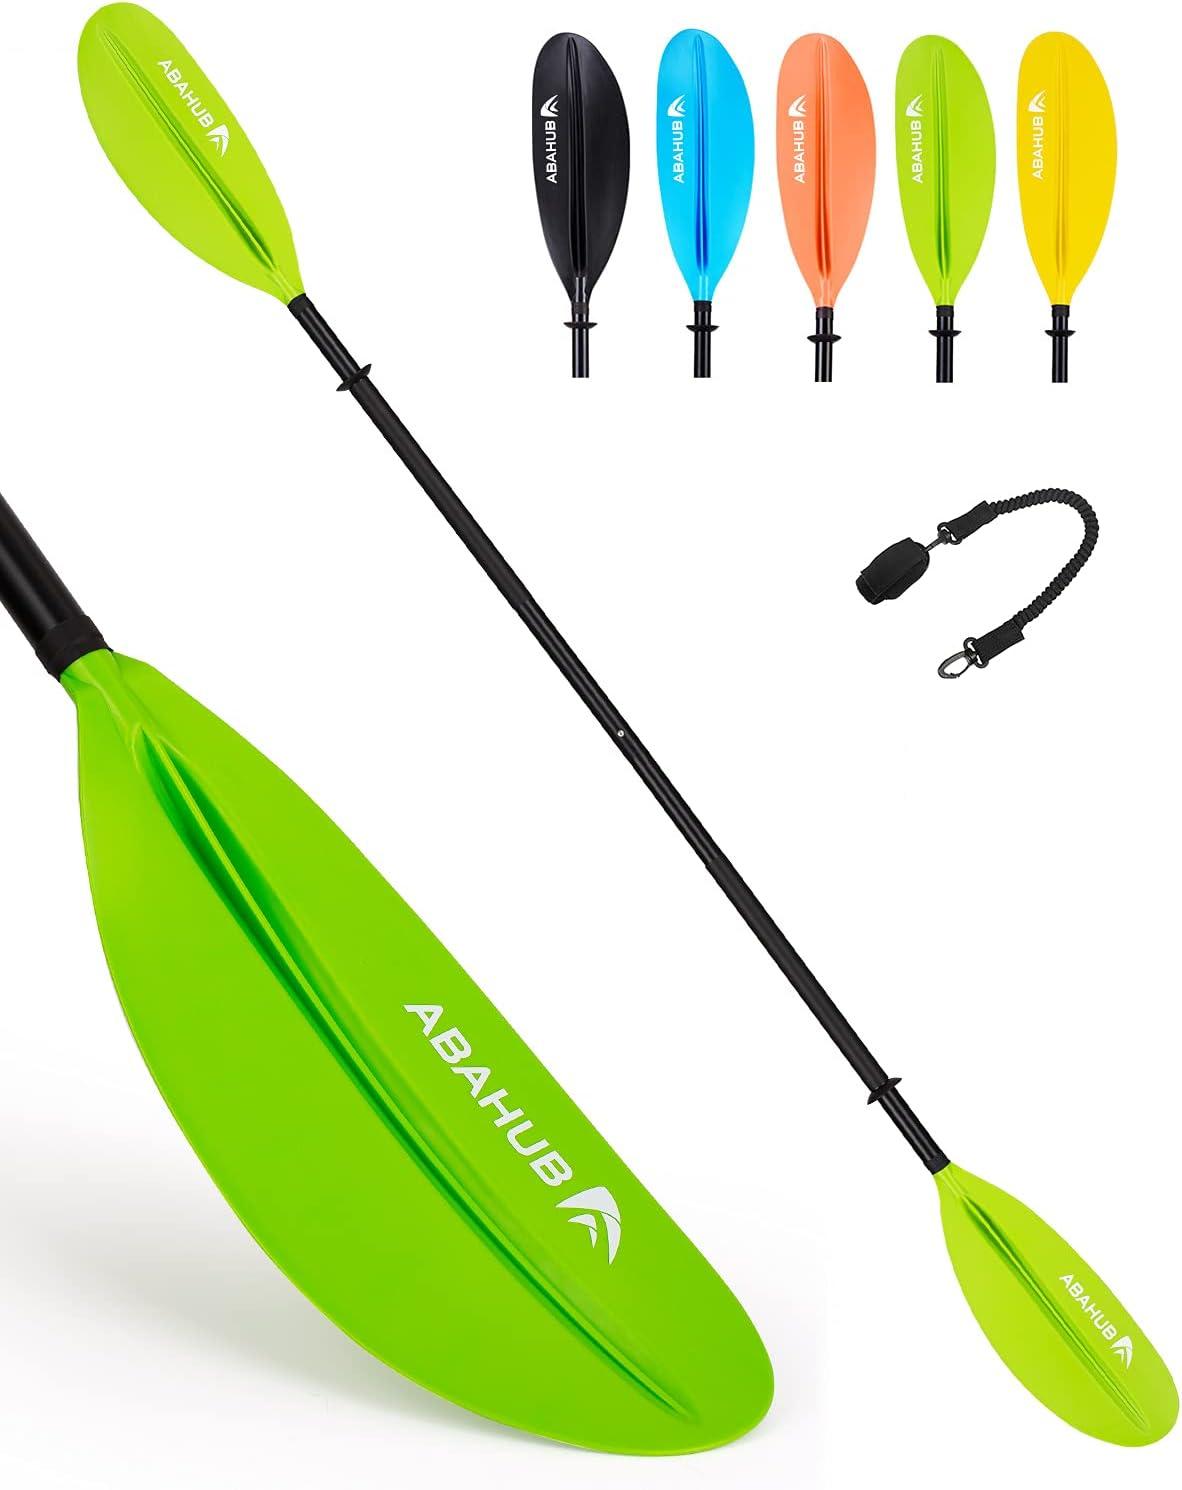 Abahub 1 x Kayak Paddles, 90.5 Inches Kayaking Oars for Boating, Canoeing with Free Paddle Leash, Aluminum Alloy Shaft Black/Blue/Green/Orange/Yellow Plastic Blades